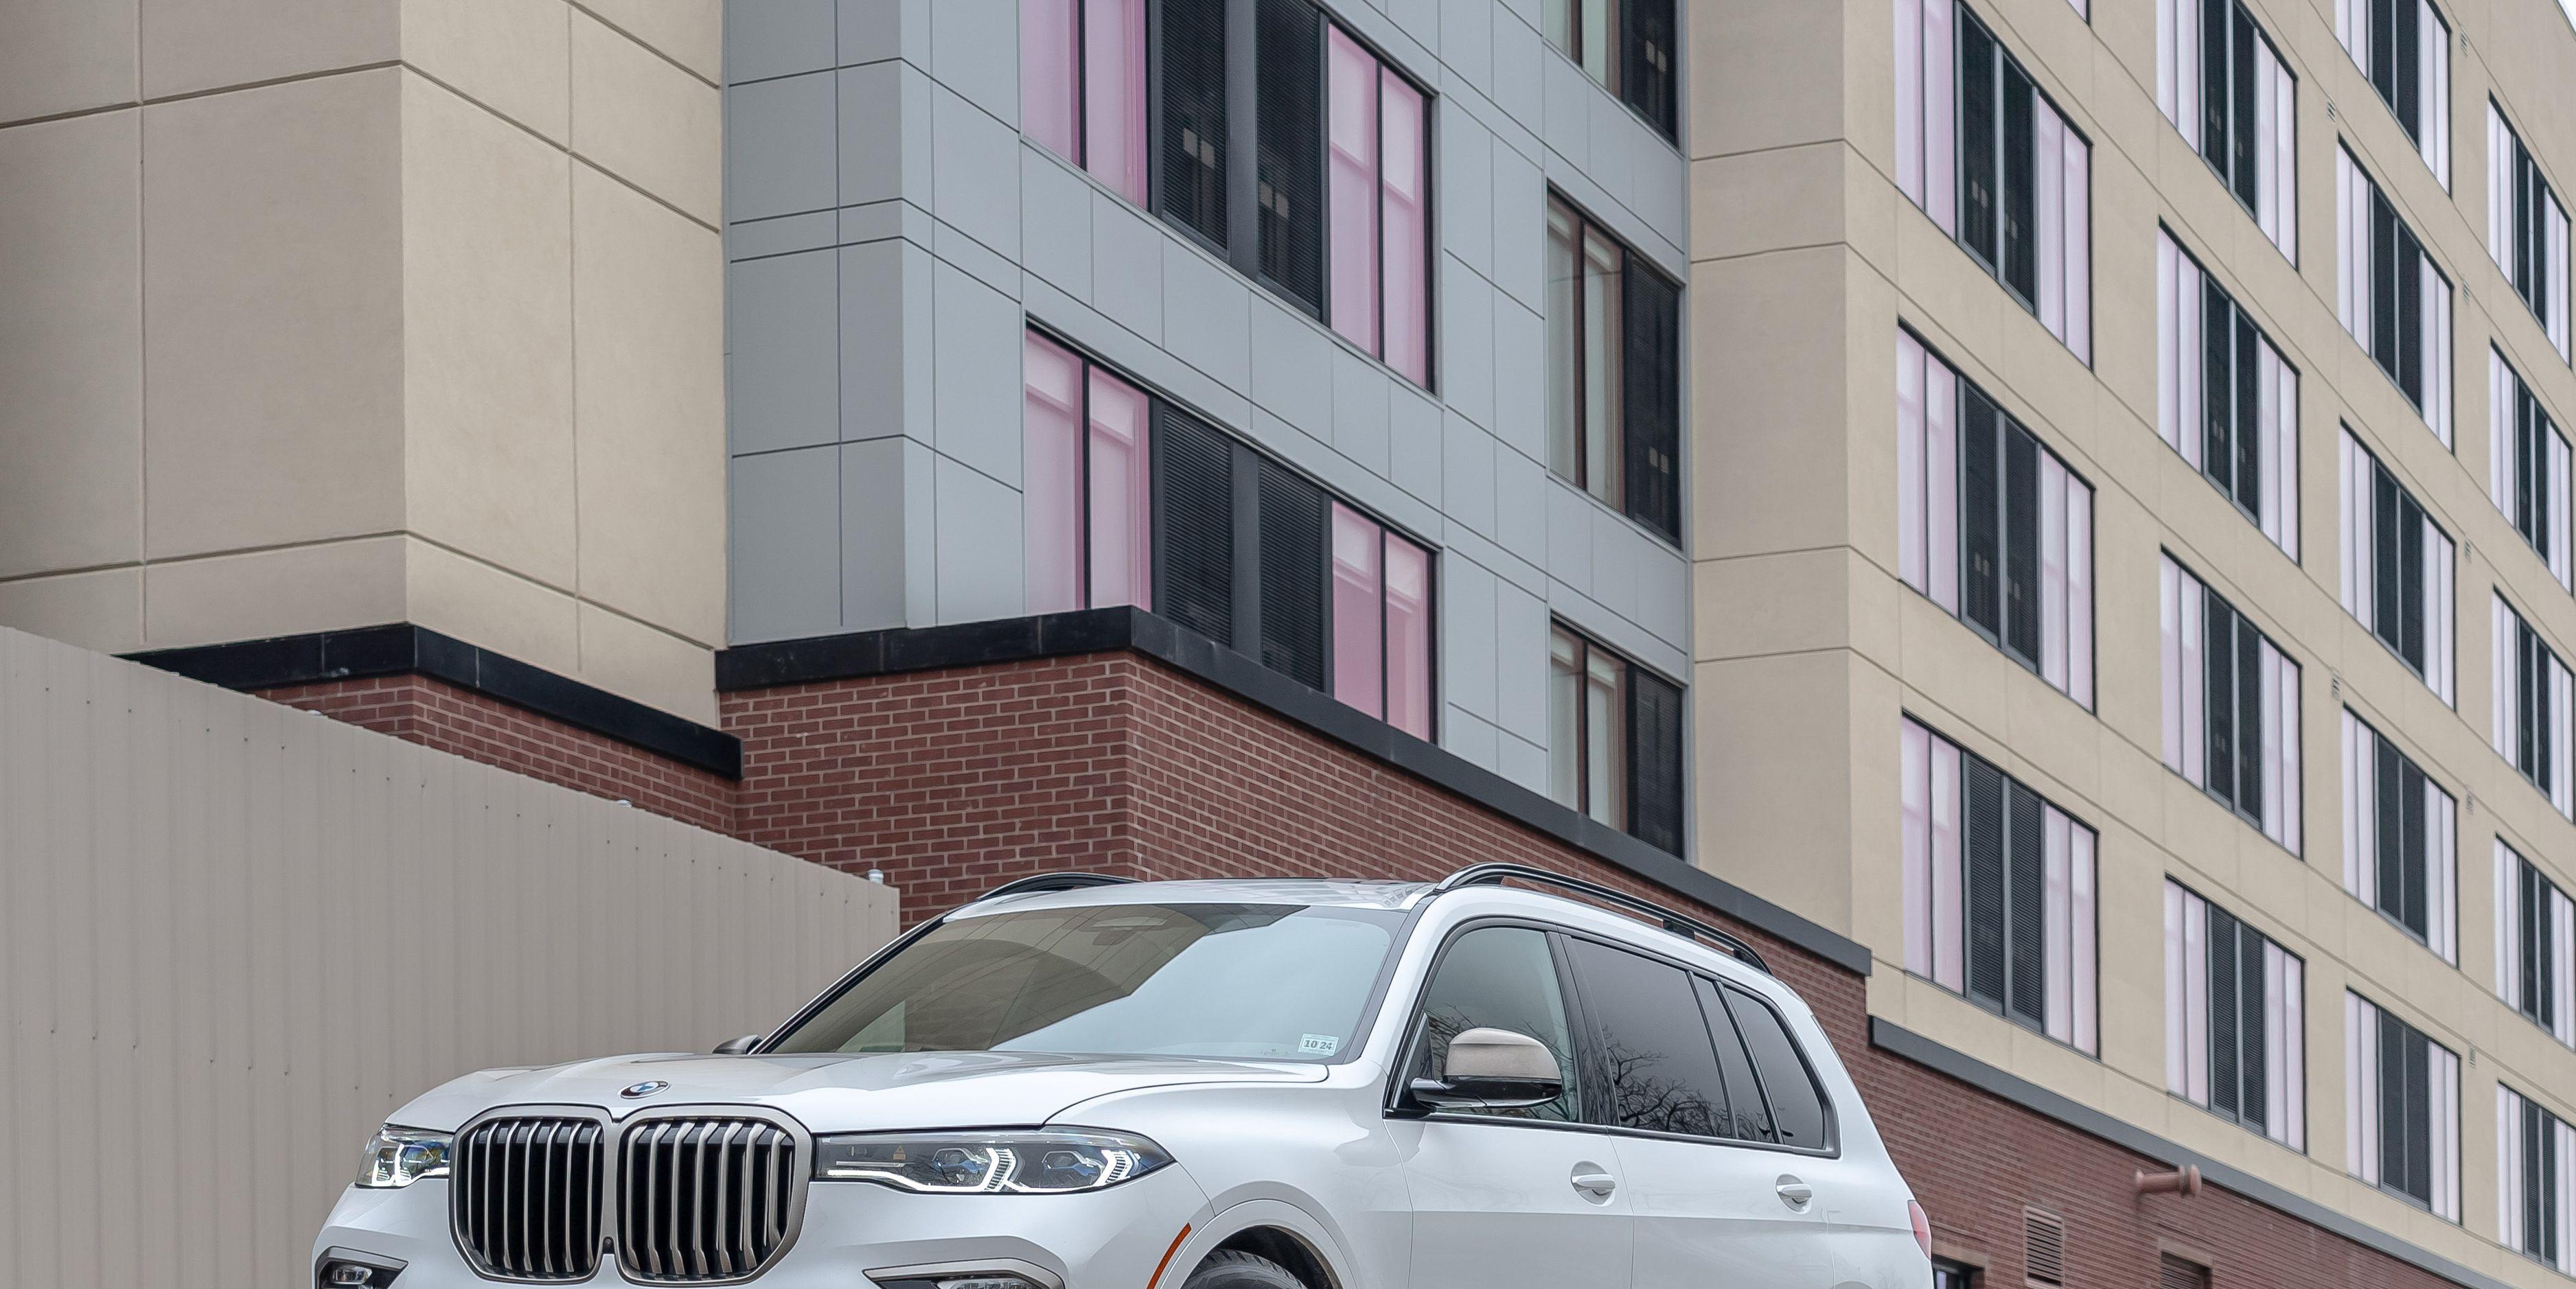 2020 BMW X7 M50i Long-Term Road Test: 10,000-Mile Update